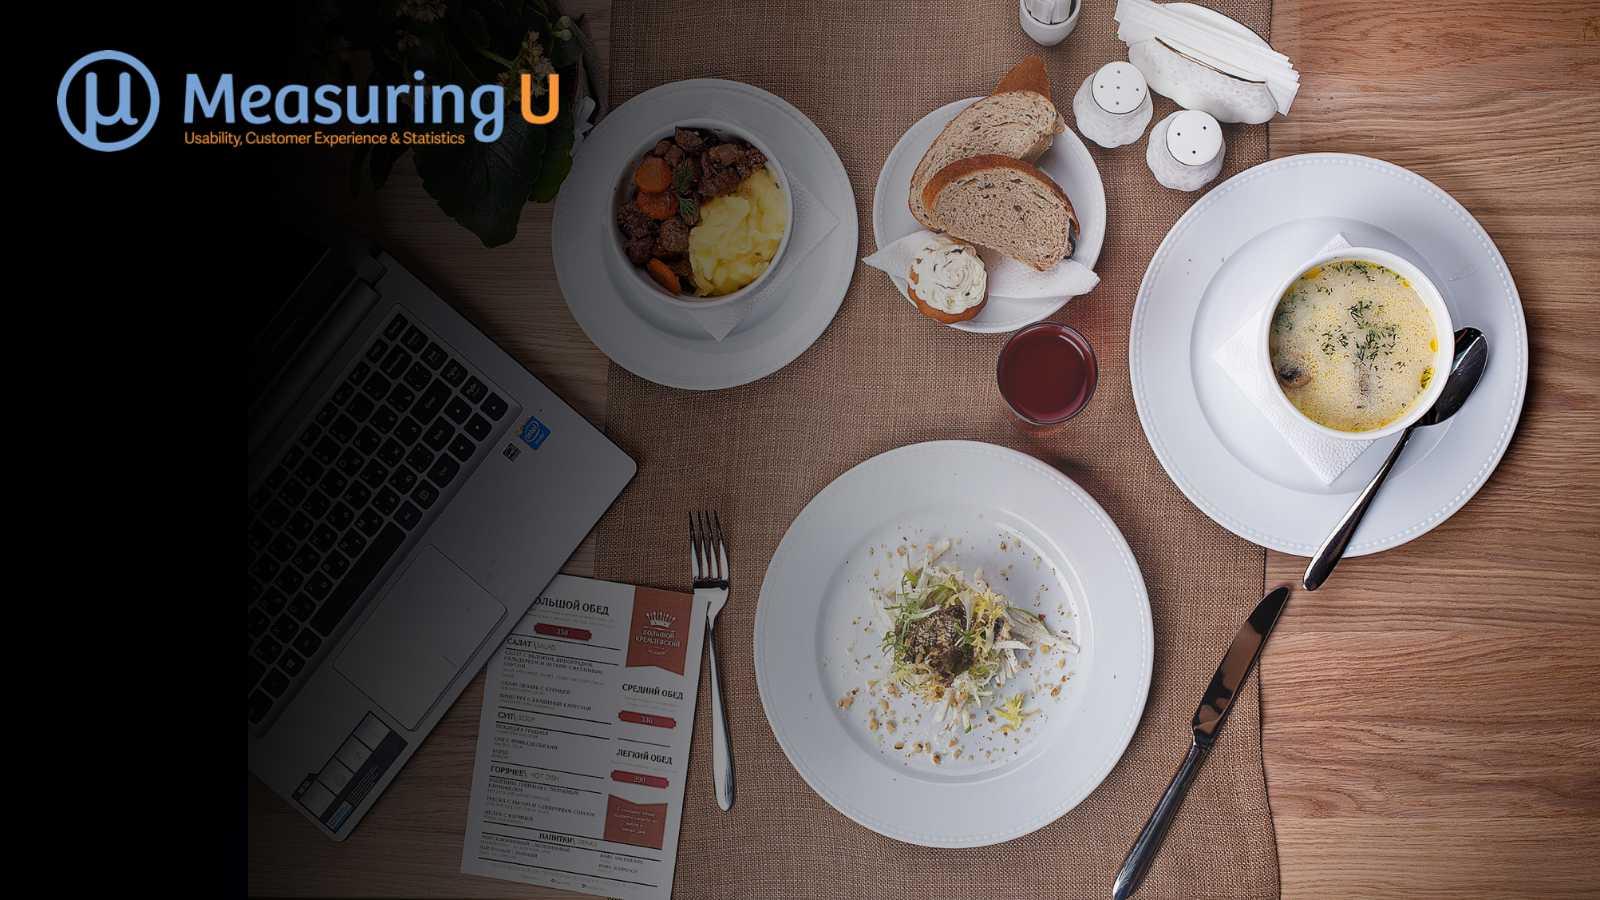 SUPRQ_Restaurants_Report2018 featured